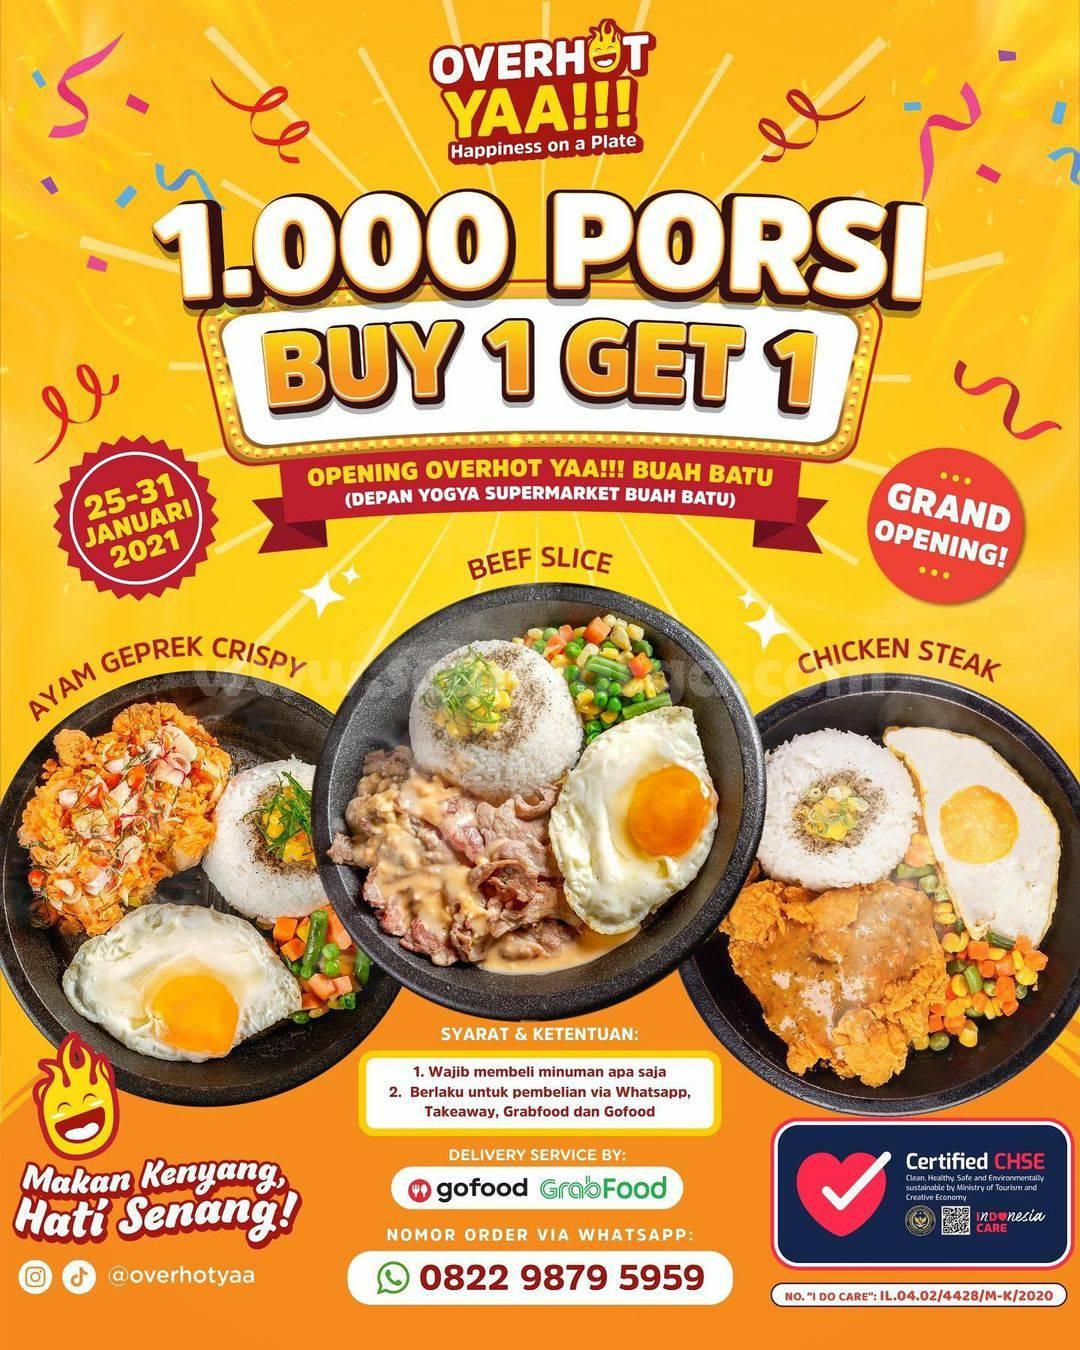 OVERHOT YAA Buah Batu Promo Opening 1.000 Porsi Buy 1 Get 1